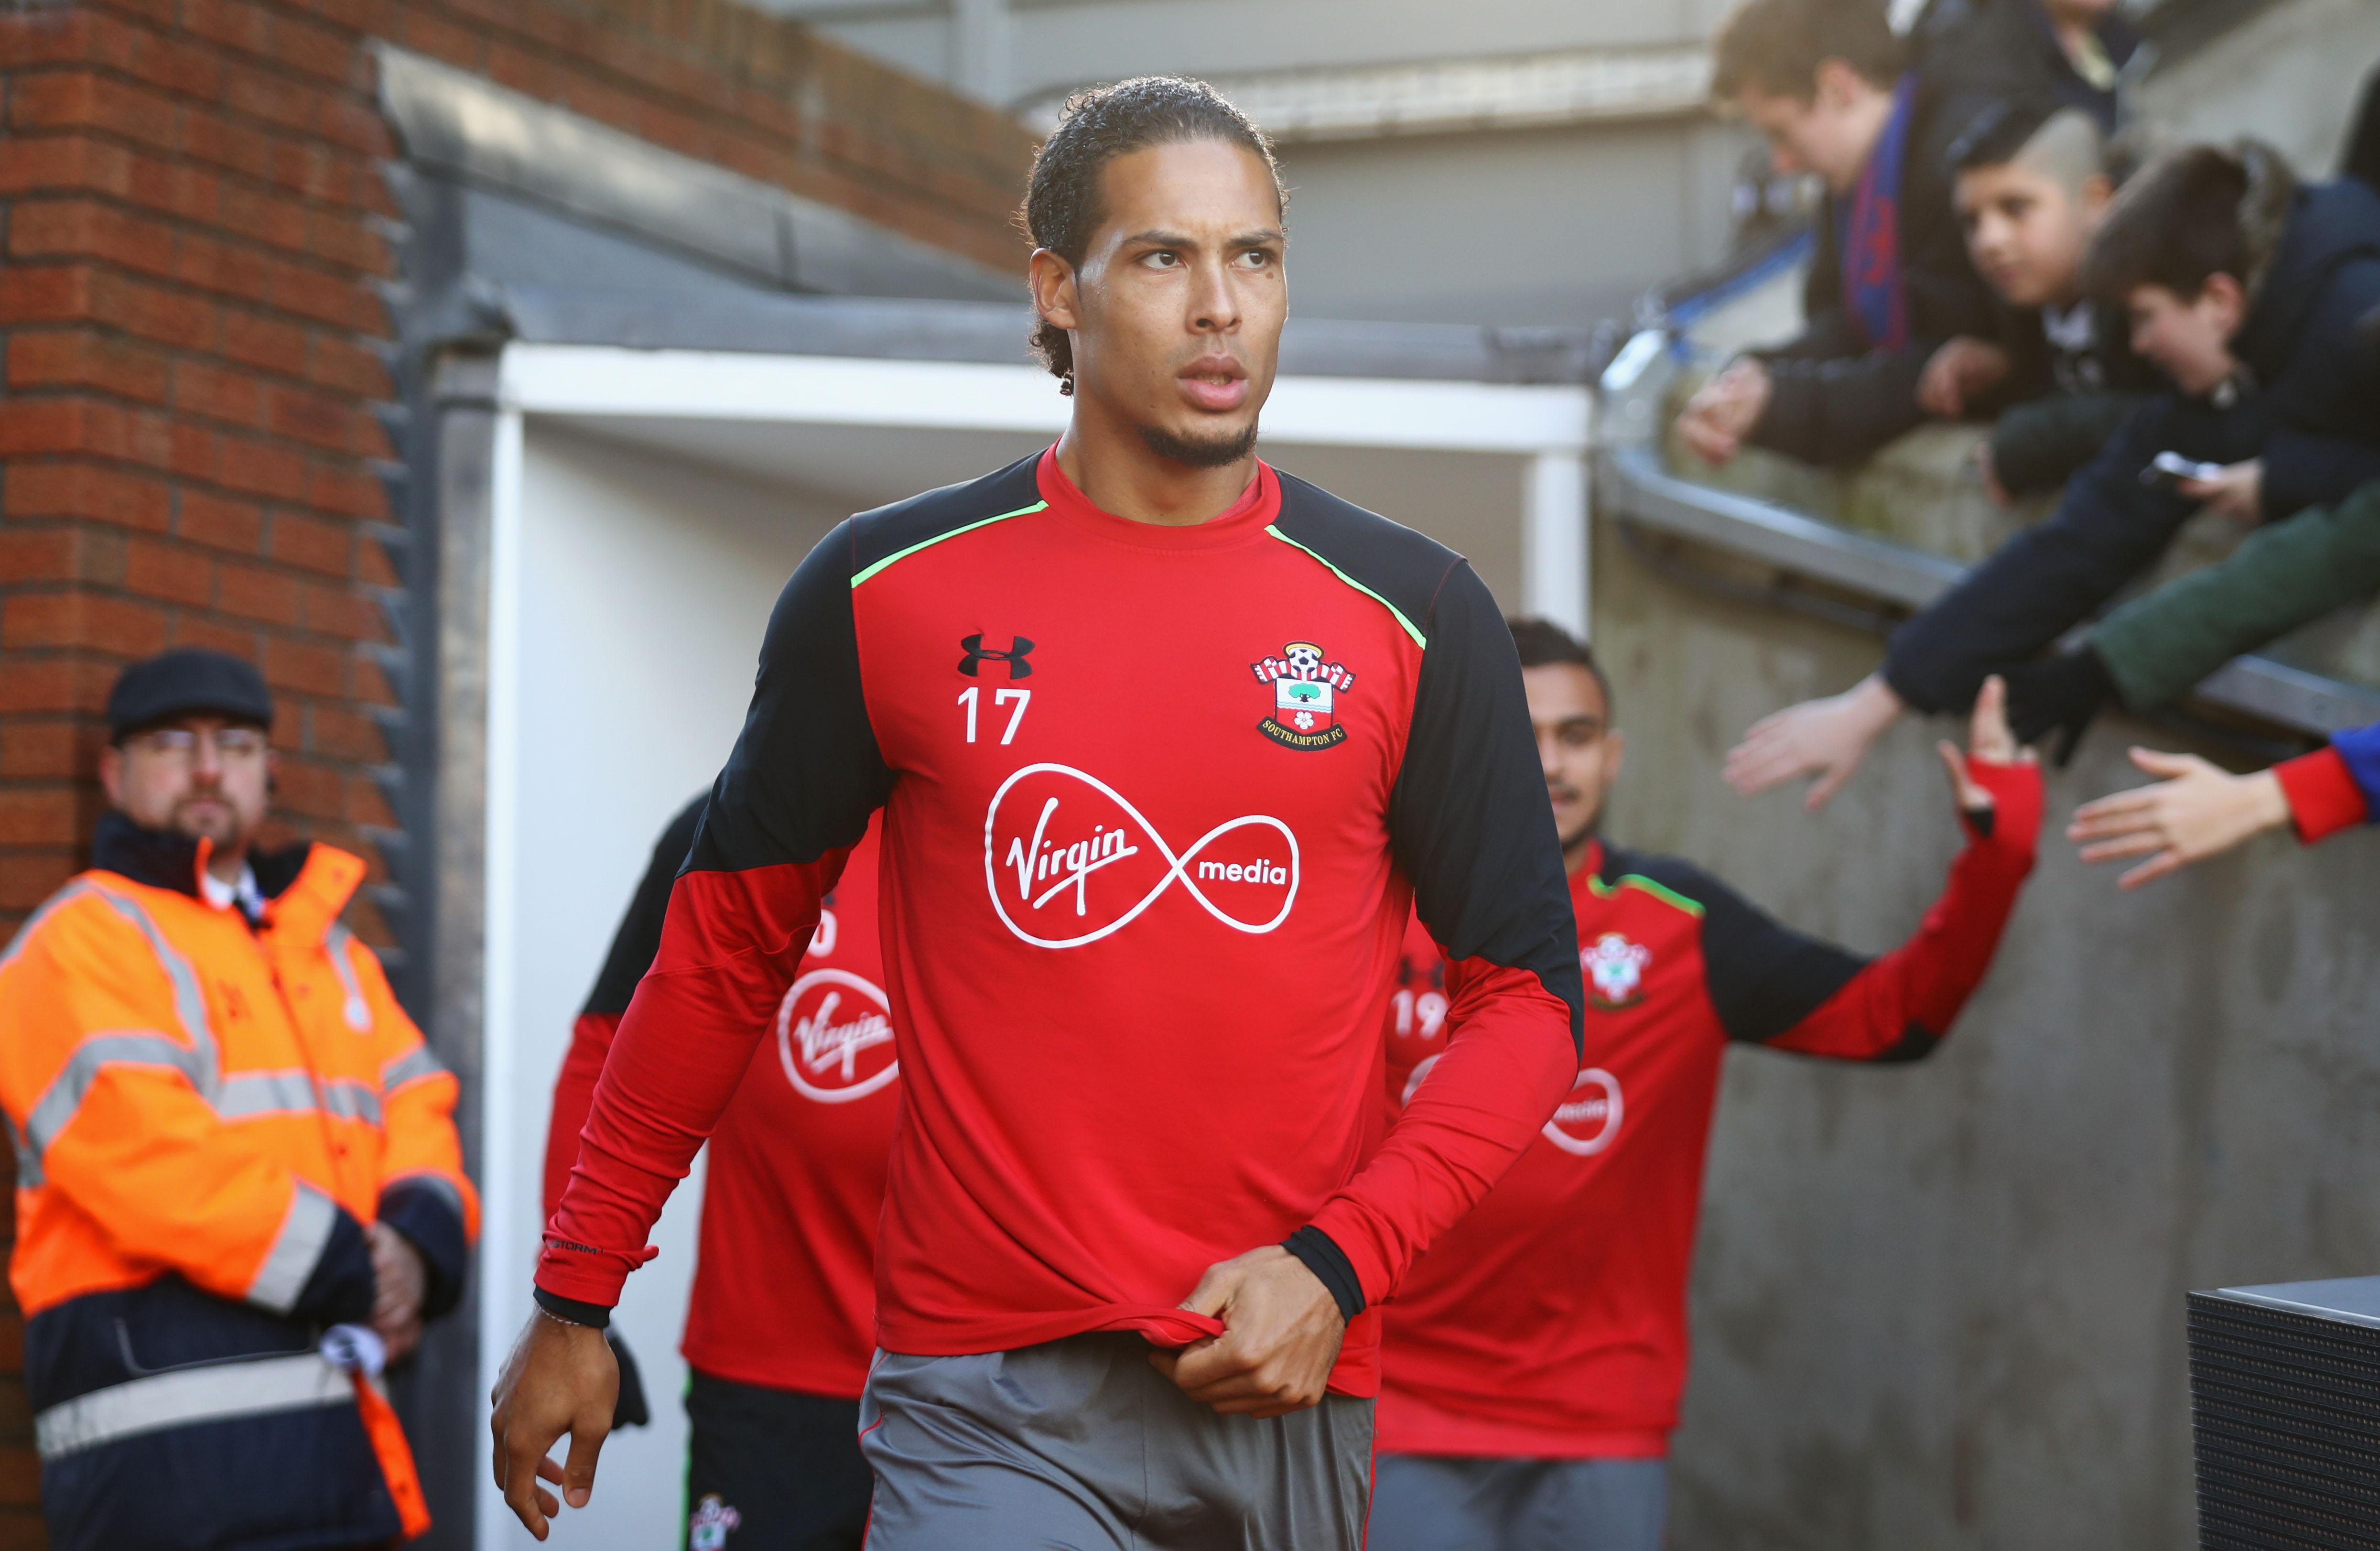 Southampton's Virgil van Dijk has fuels transfer talk: 'I want to play at the highest level'